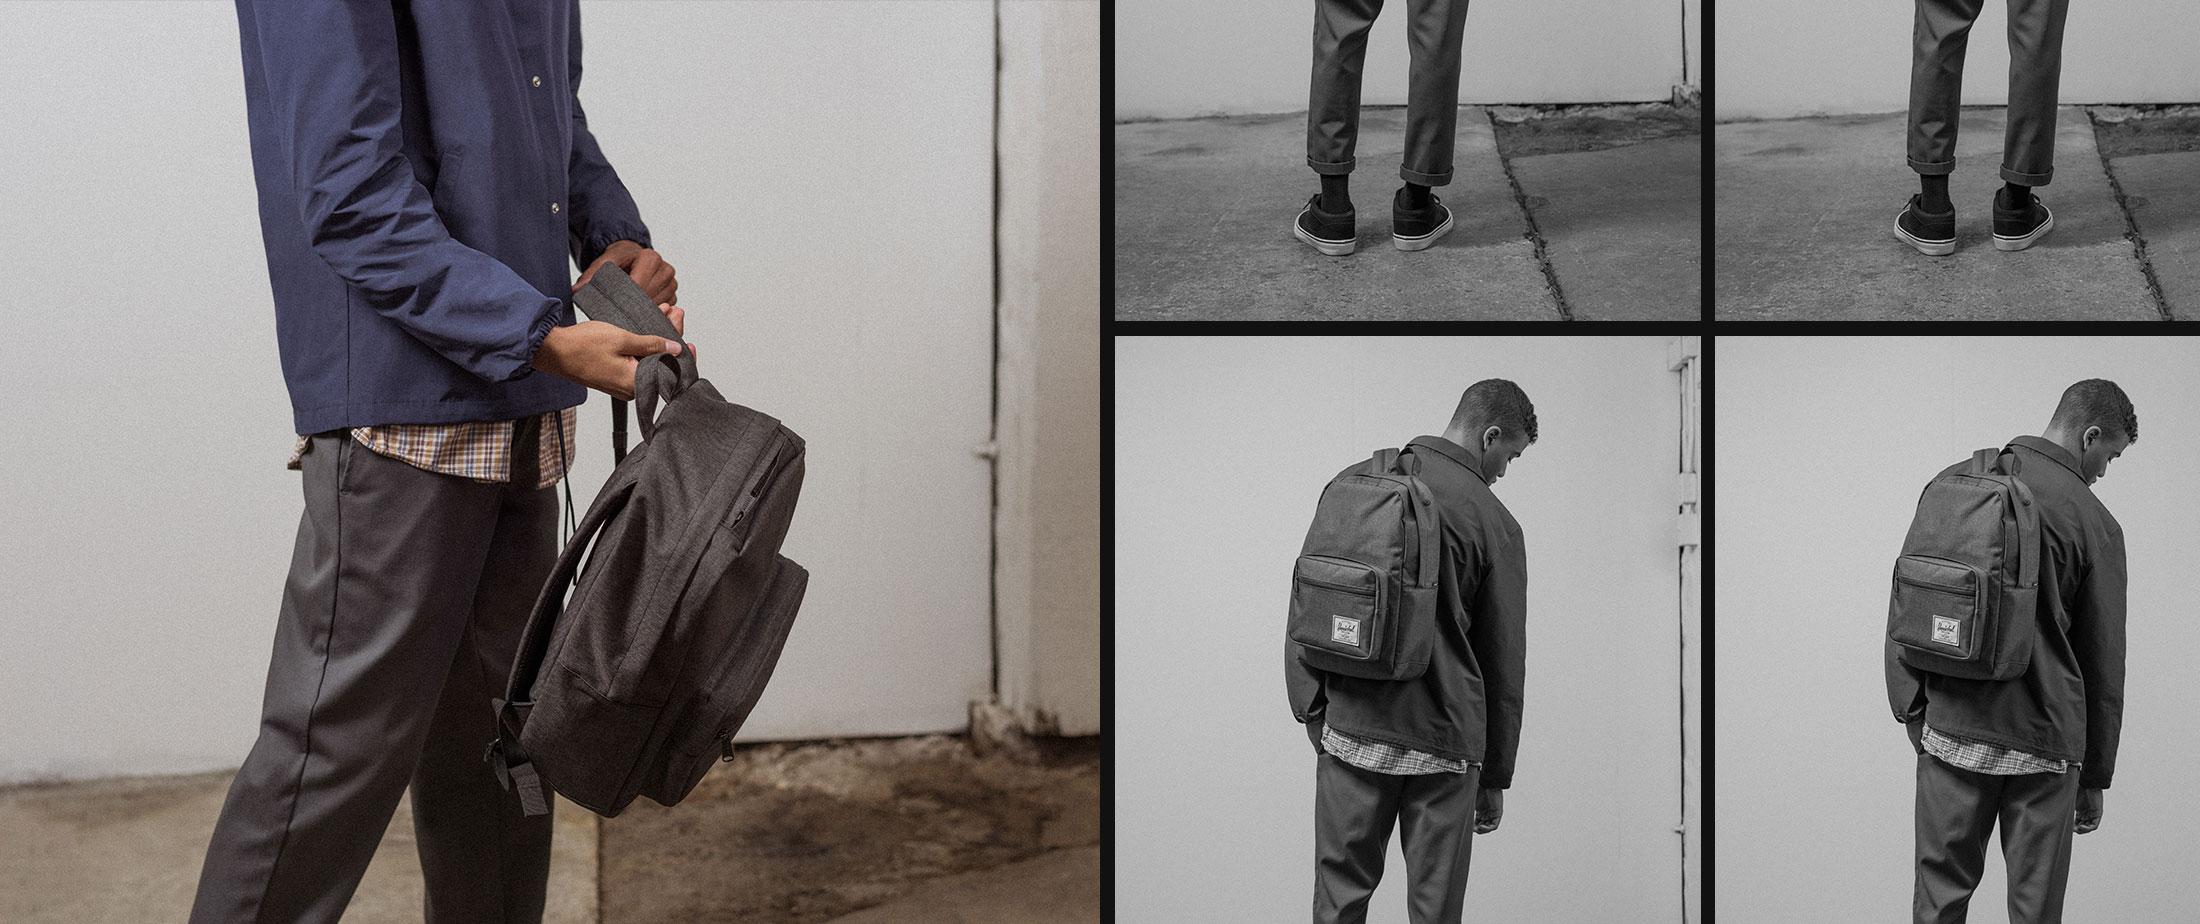 Backpacks And Bags Herschel Supply Company Tas Wanita Hand Bag Ssf0686